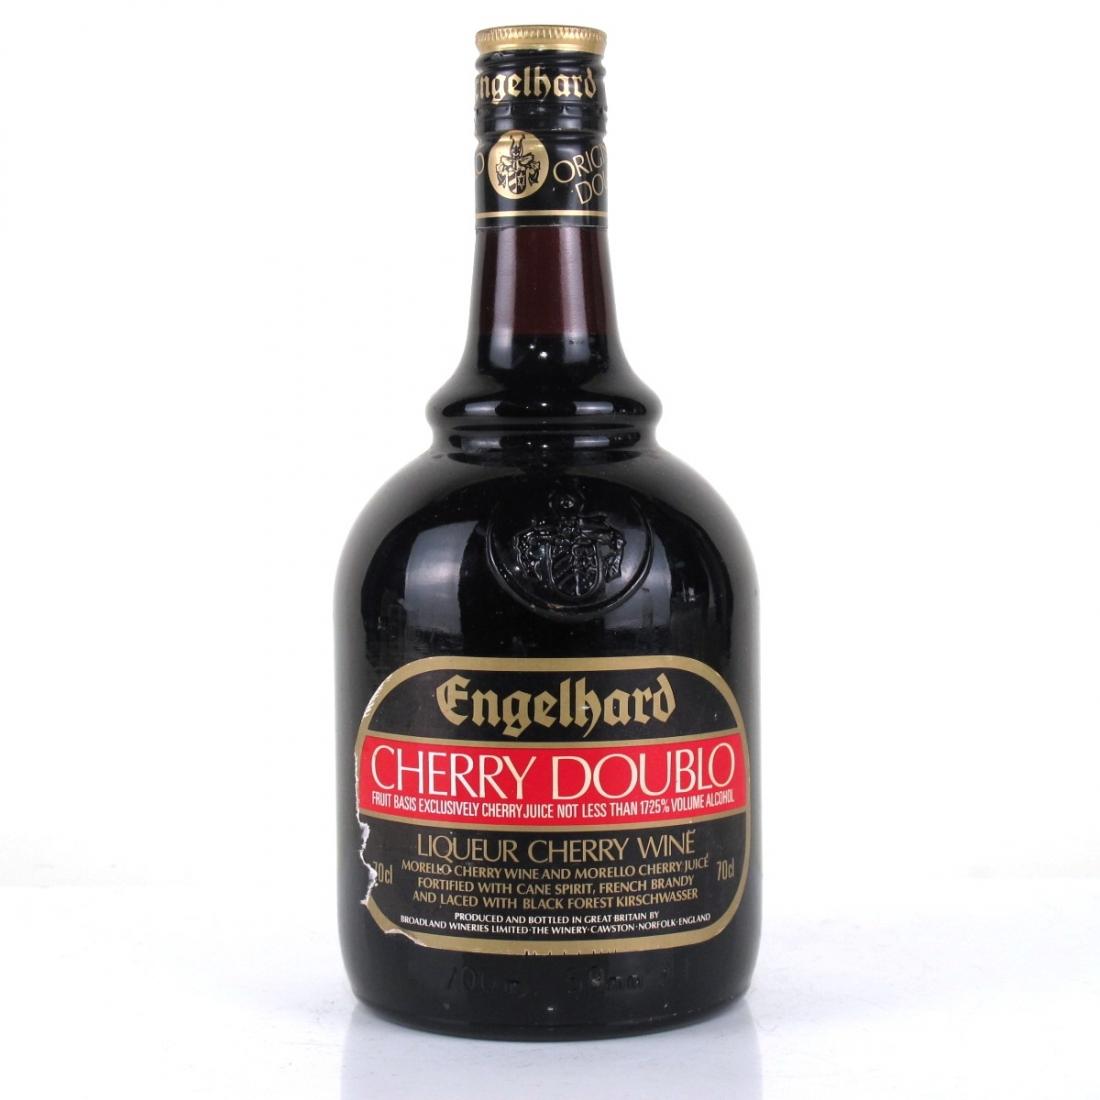 Englehard Cherry Doublo Liqure